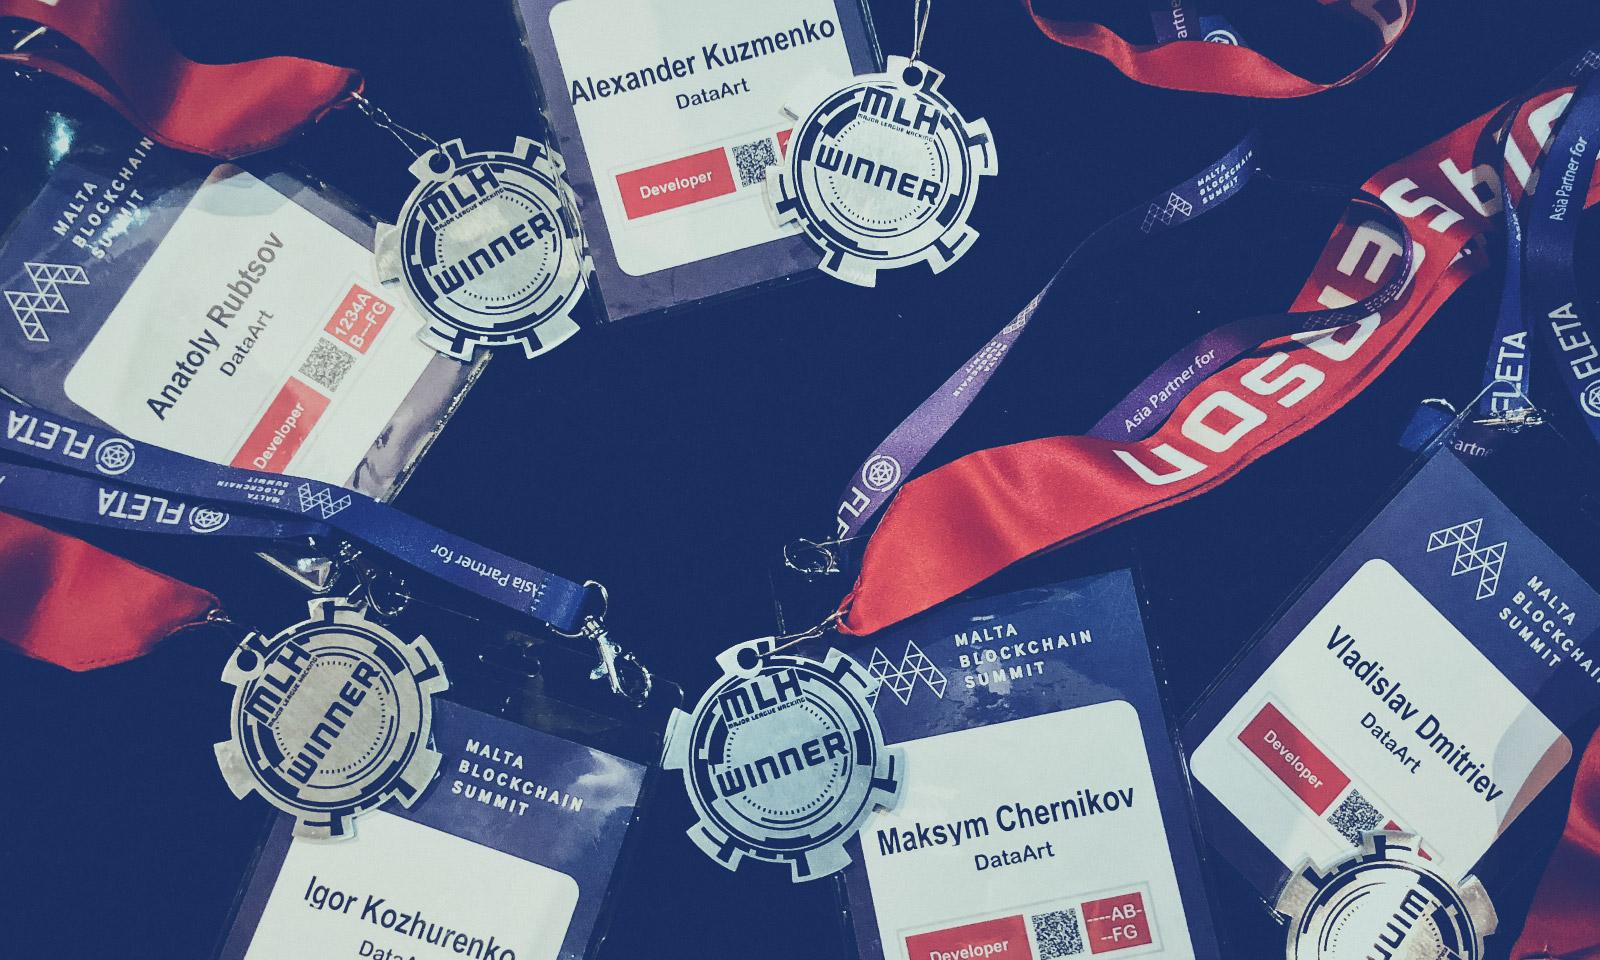 Блокчейн-благотворительность — DataArt победил на хакатоне Malta Blockchain Summit - 1